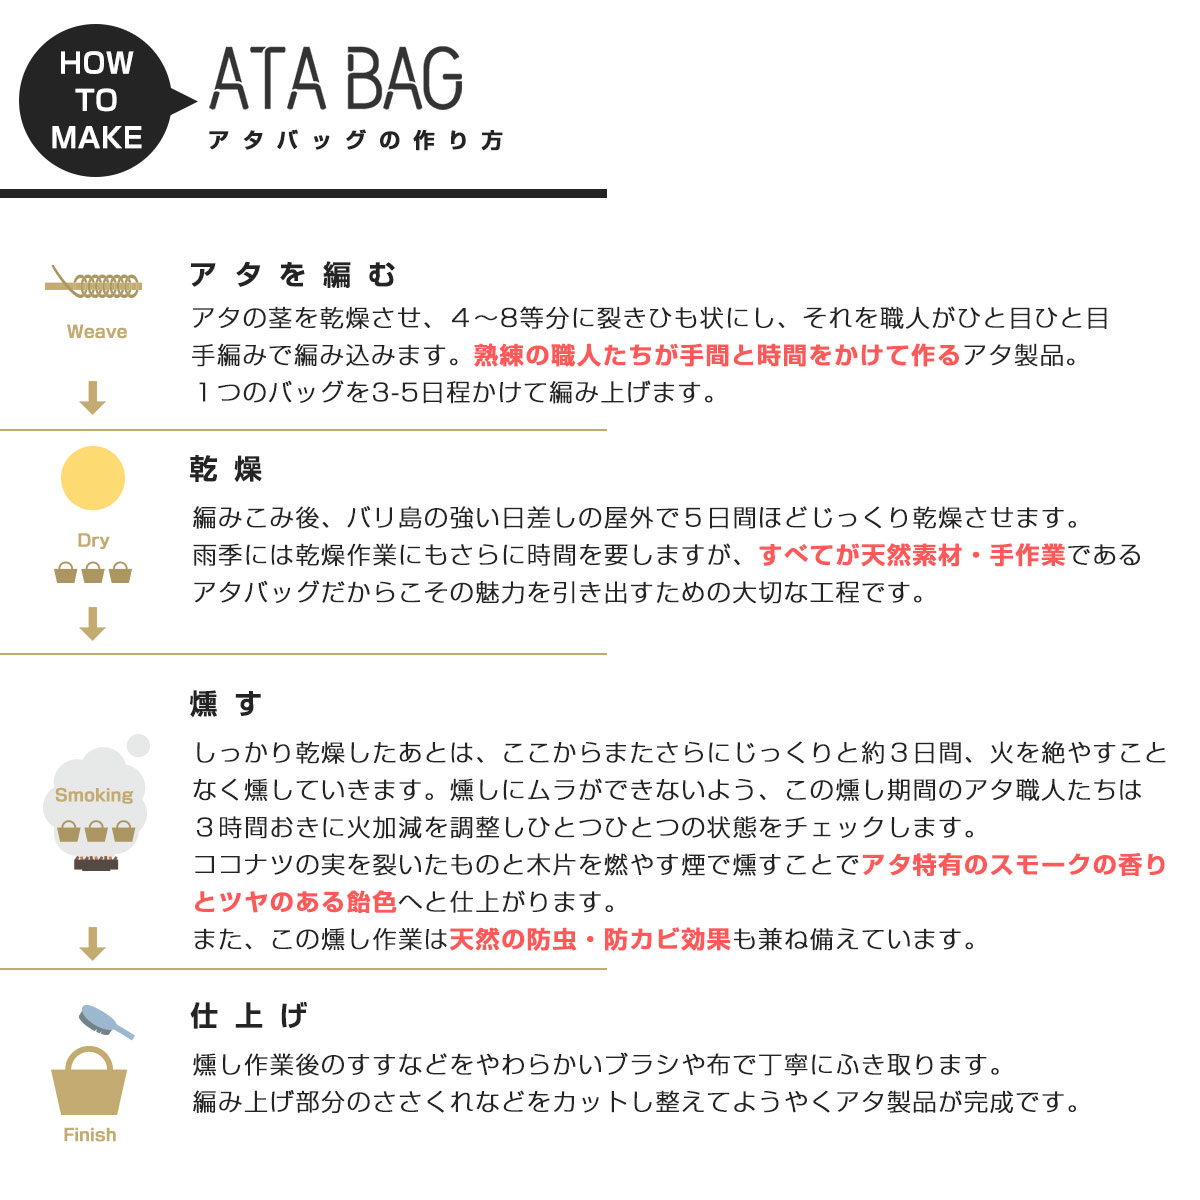 【ATABAG】LaCuteオリジナルテキスタイルかごトートバッグL[ピンクパイン]